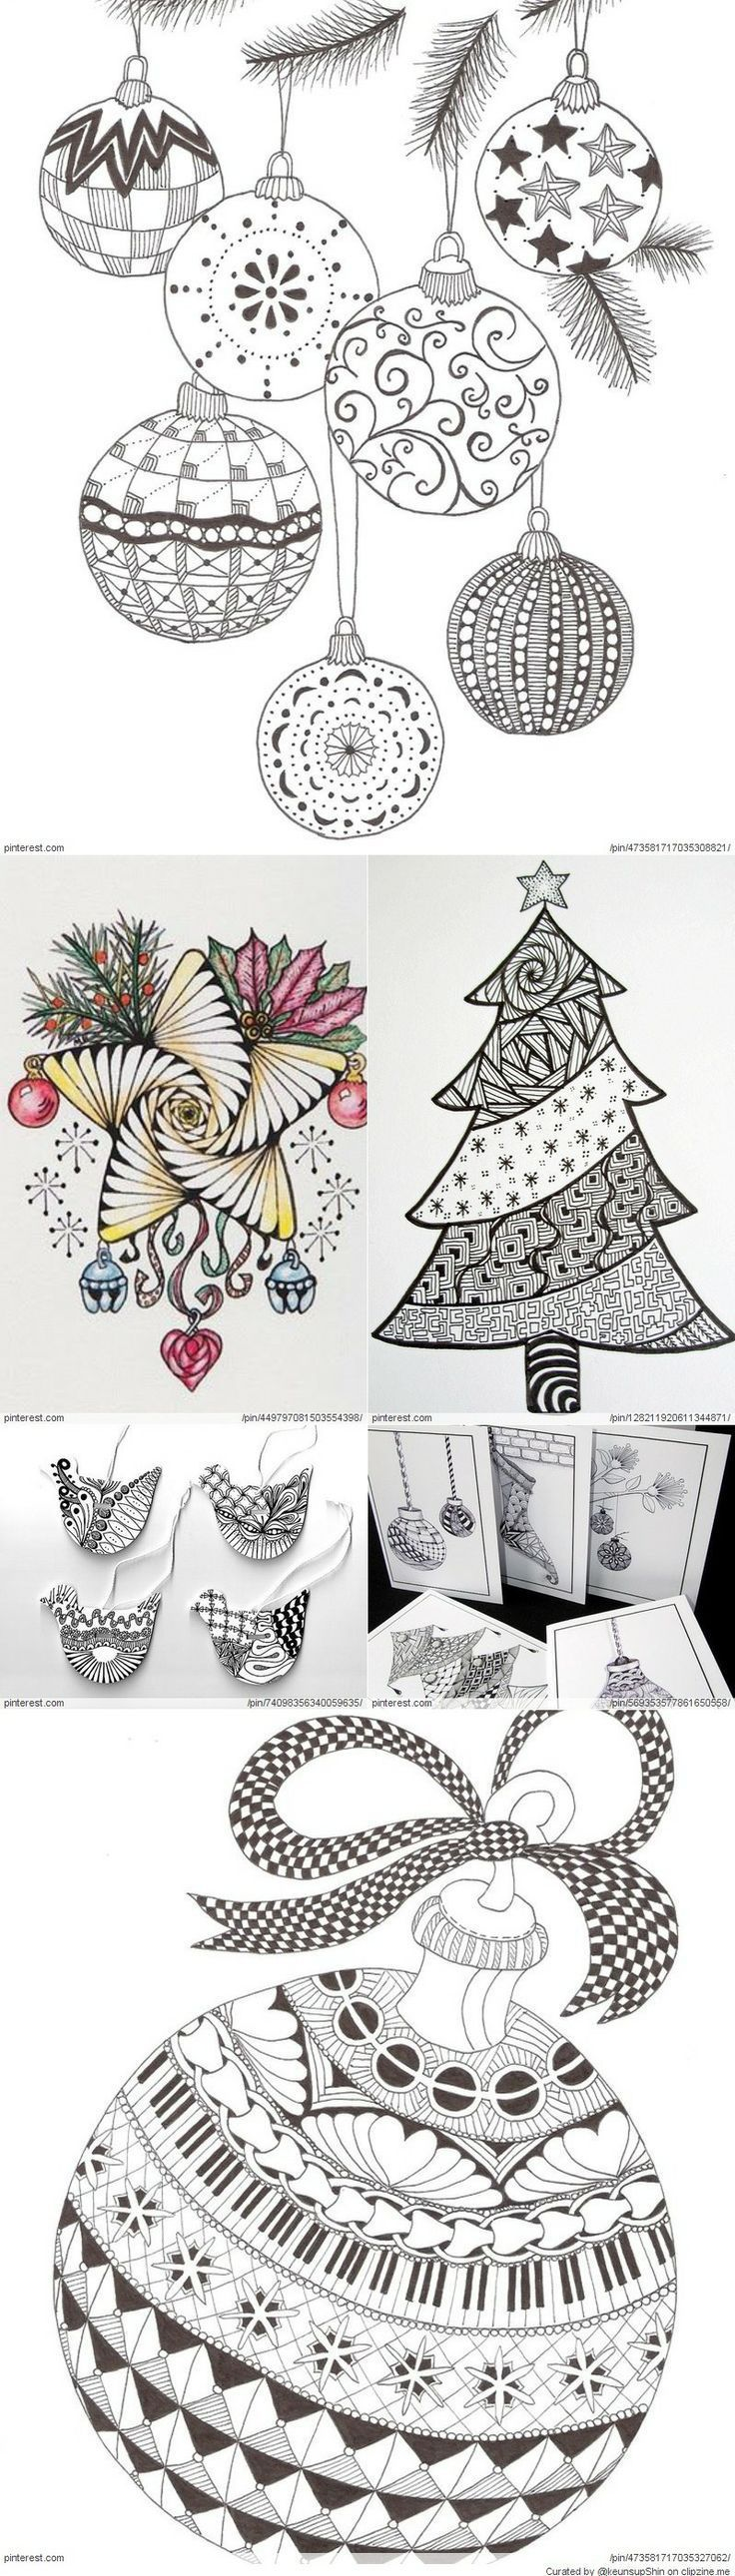 Zentangle Ornaments Zentangle Patterns Christmas Doodles Christmas Art